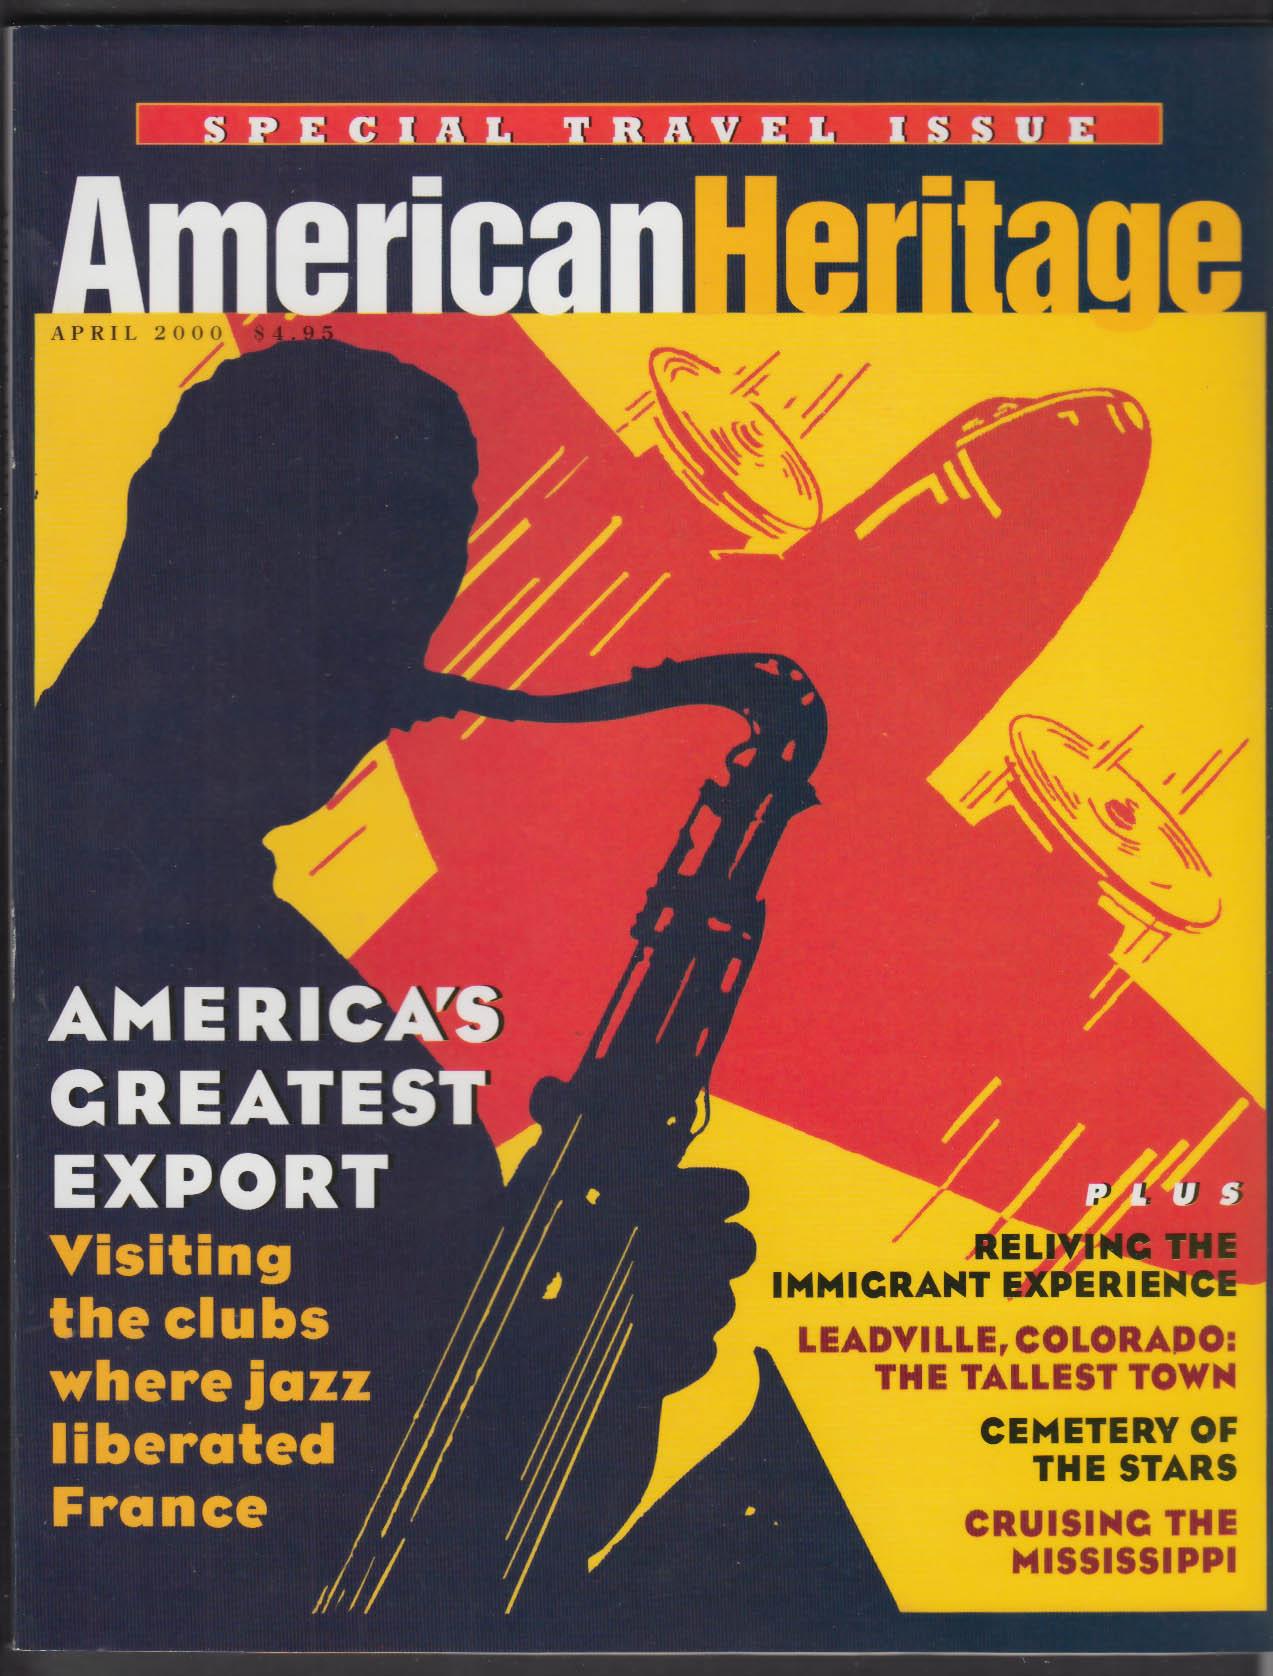 AMERICAN HERITAGE Jazz Tenement Museum Robert McCormick + 4 2000